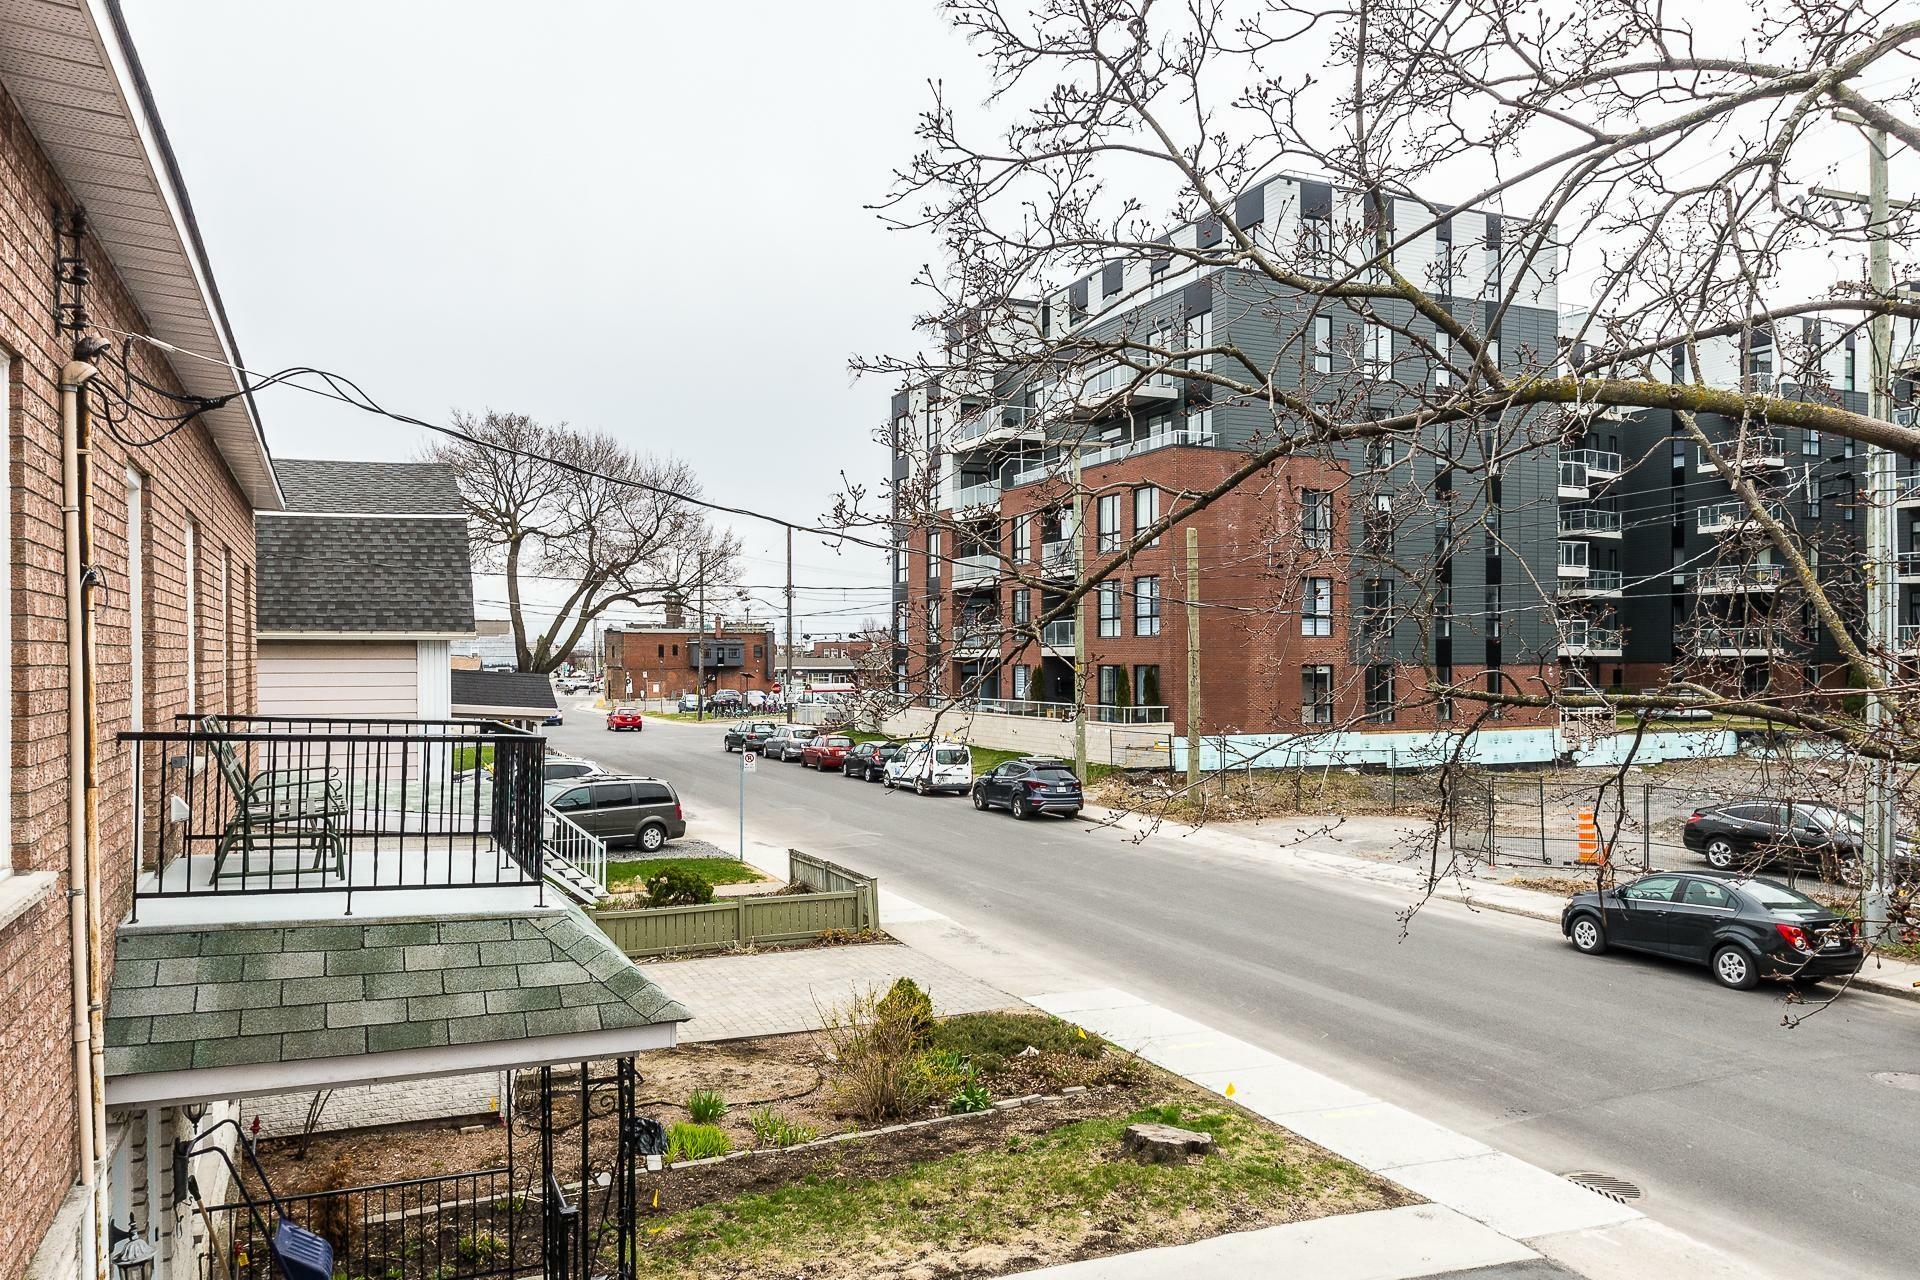 image 15 - Duplex En venta Montréal Lachine  - 3 habitaciones